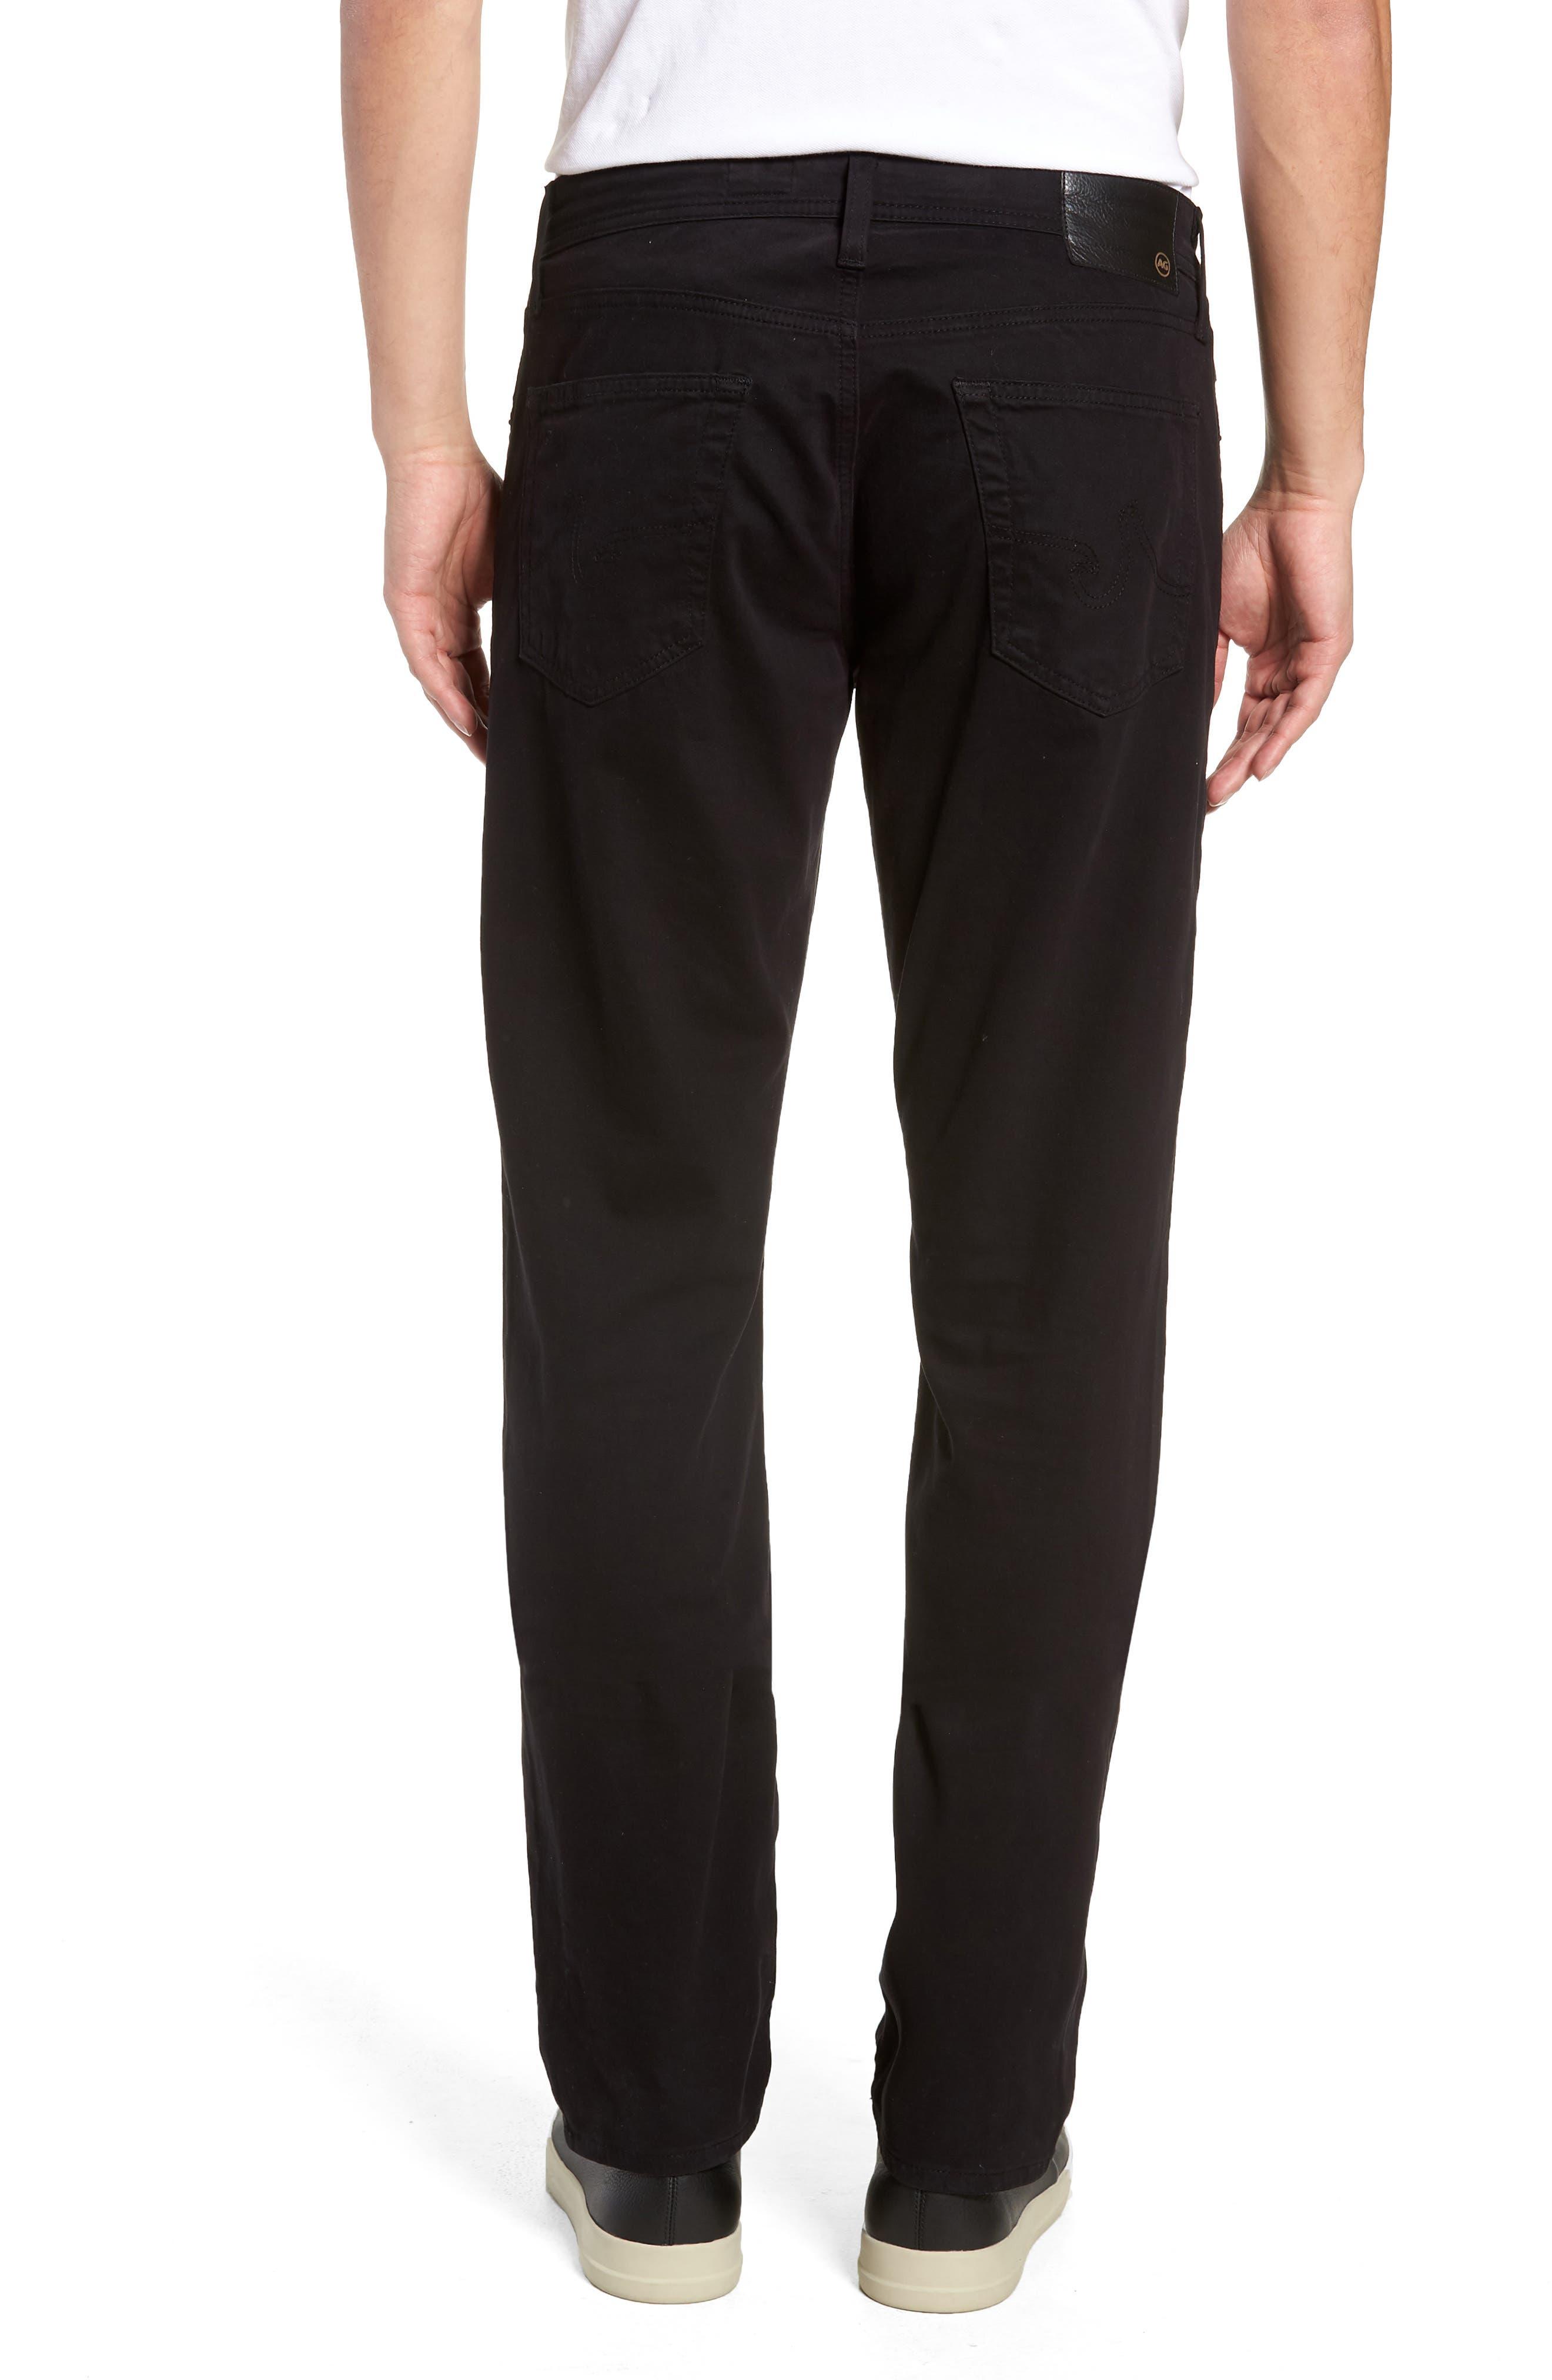 Graduate SUD Slim Straight Leg Pants,                             Alternate thumbnail 3, color,                             010